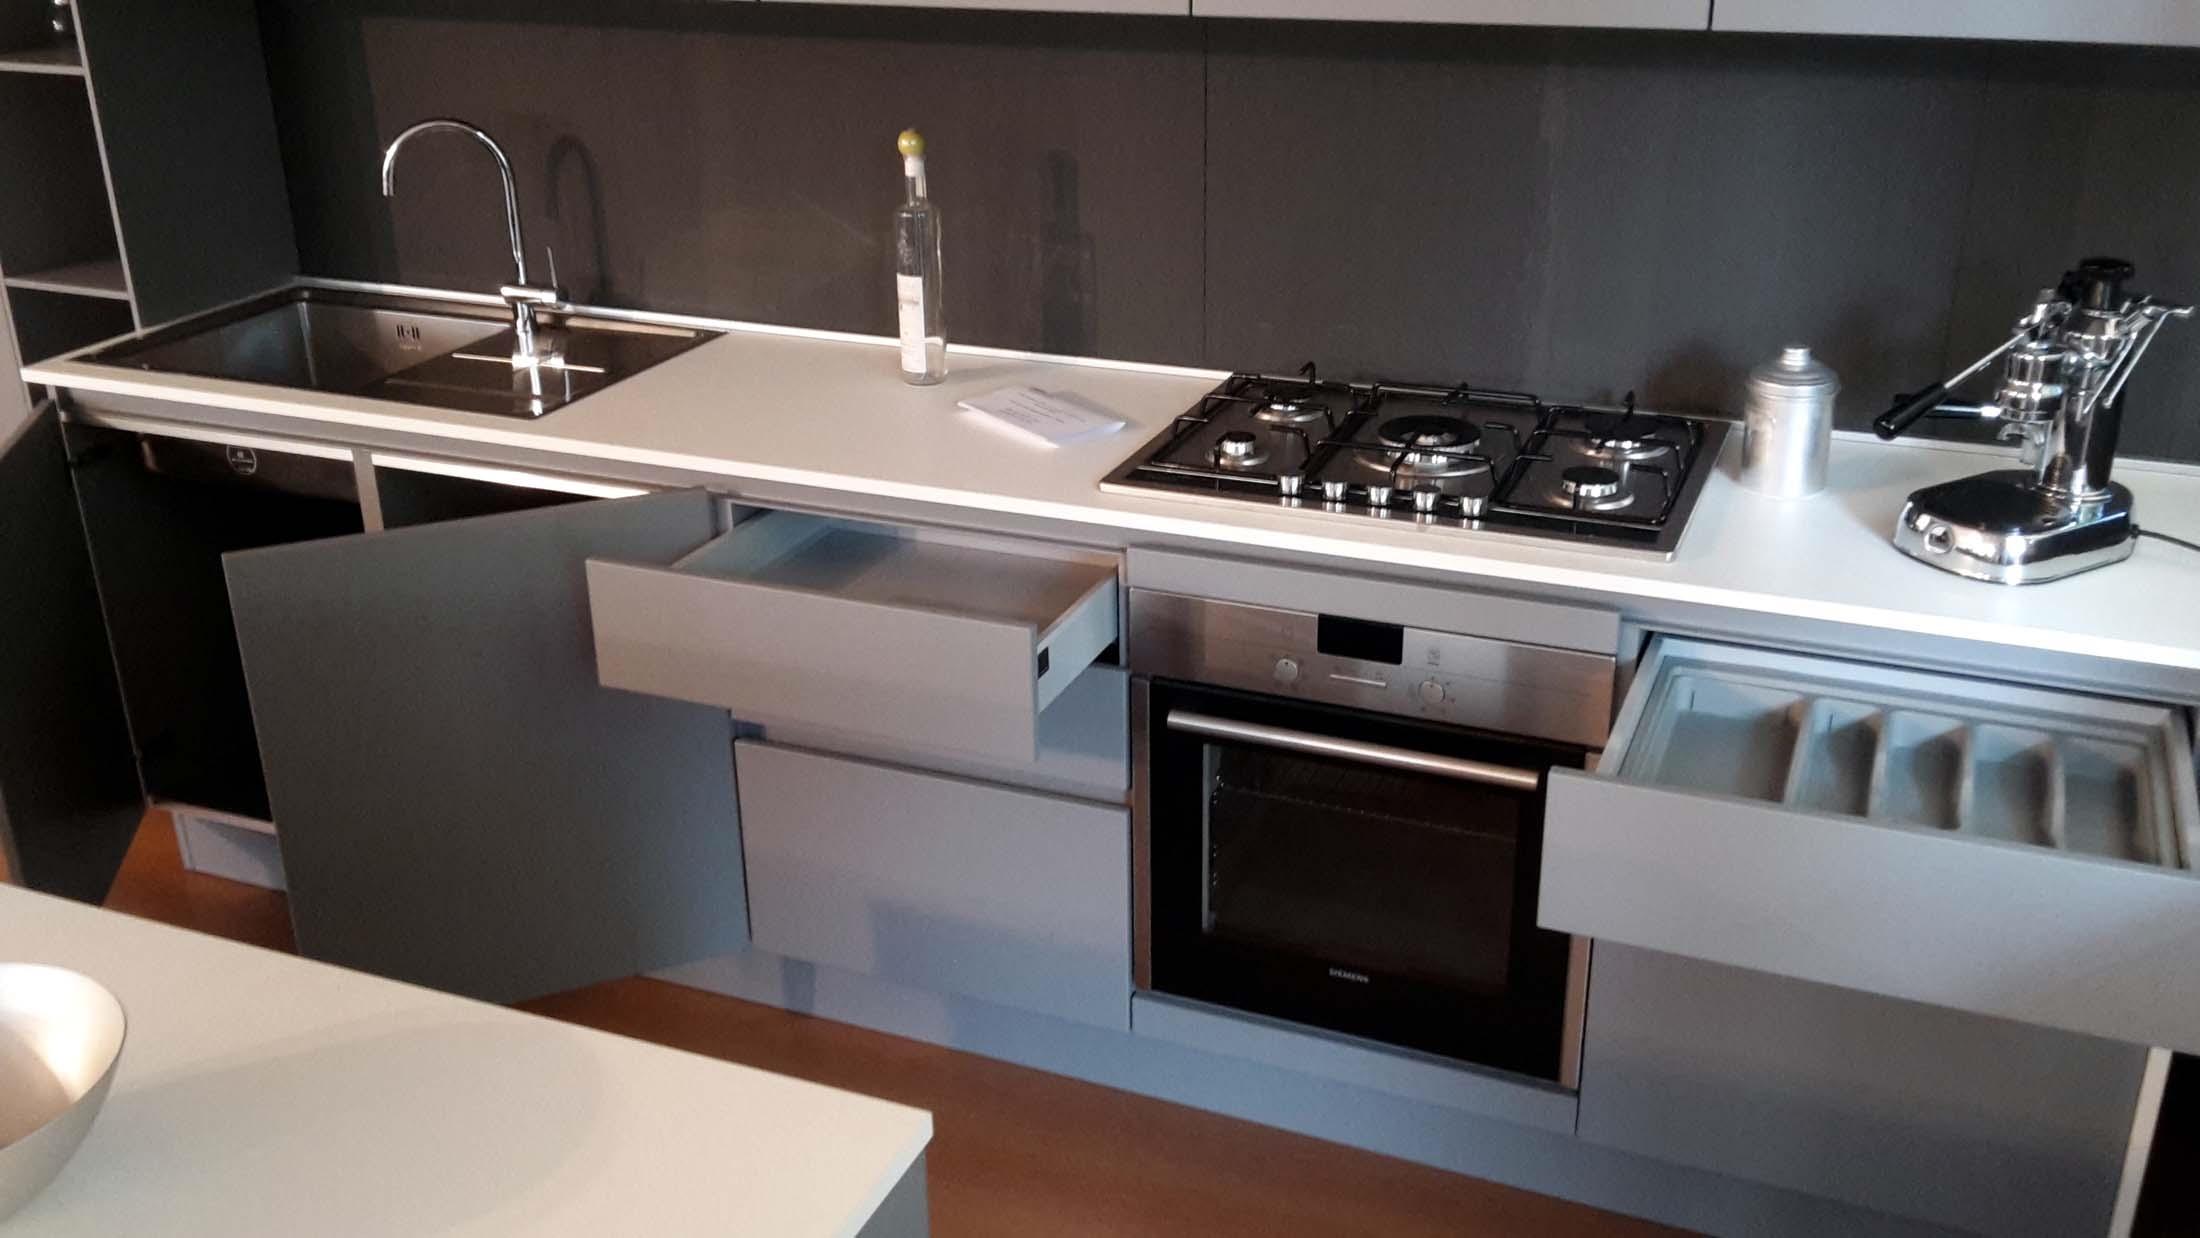 cucine arrital - 28 images - l eleganza dell acciaio la cucina ak04 ...